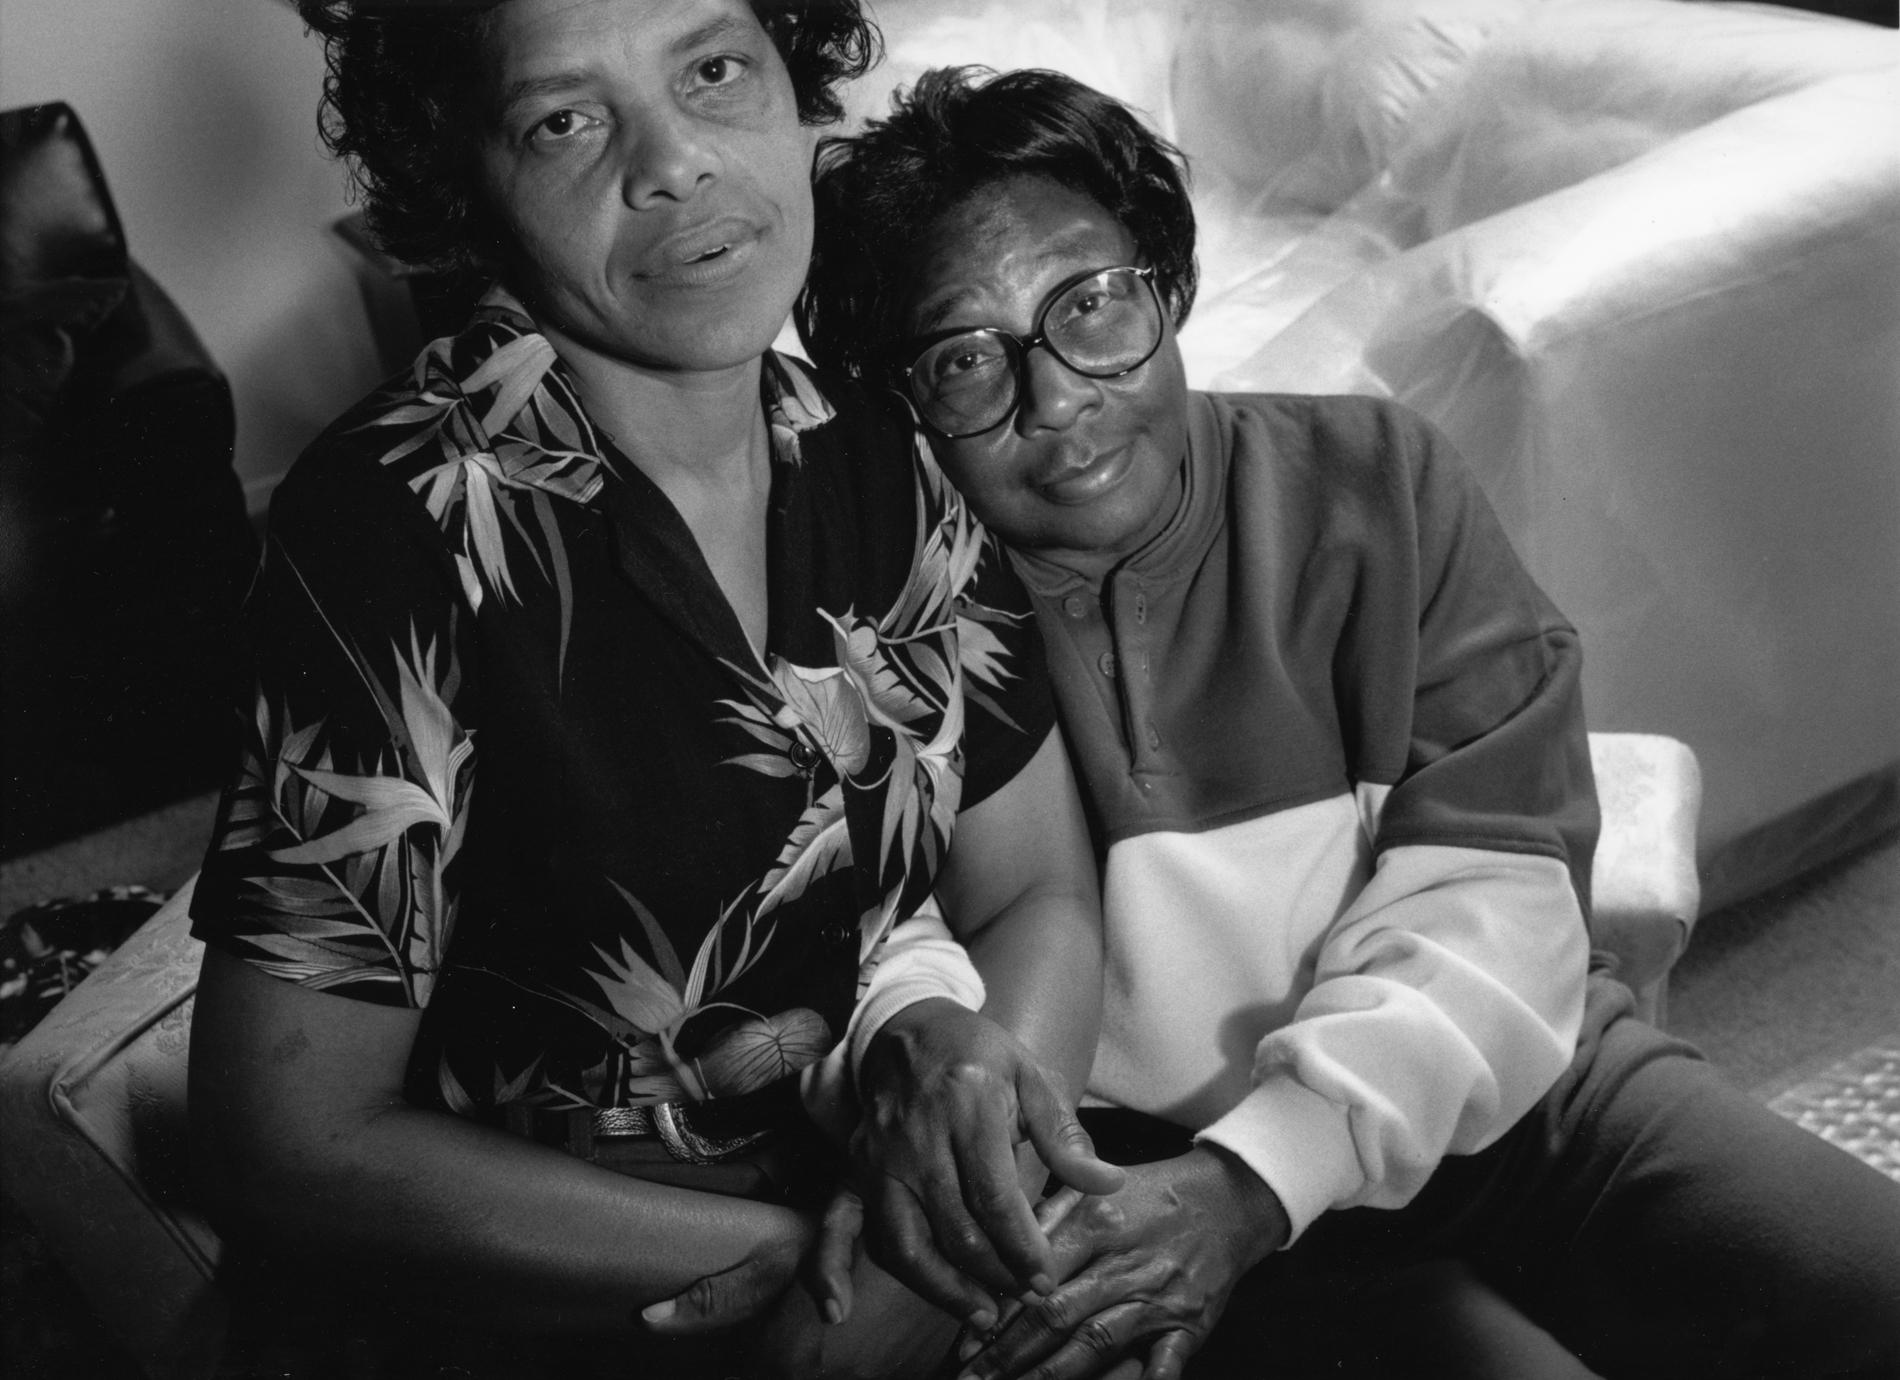 Kate and Seleta, Mississippi, 1993